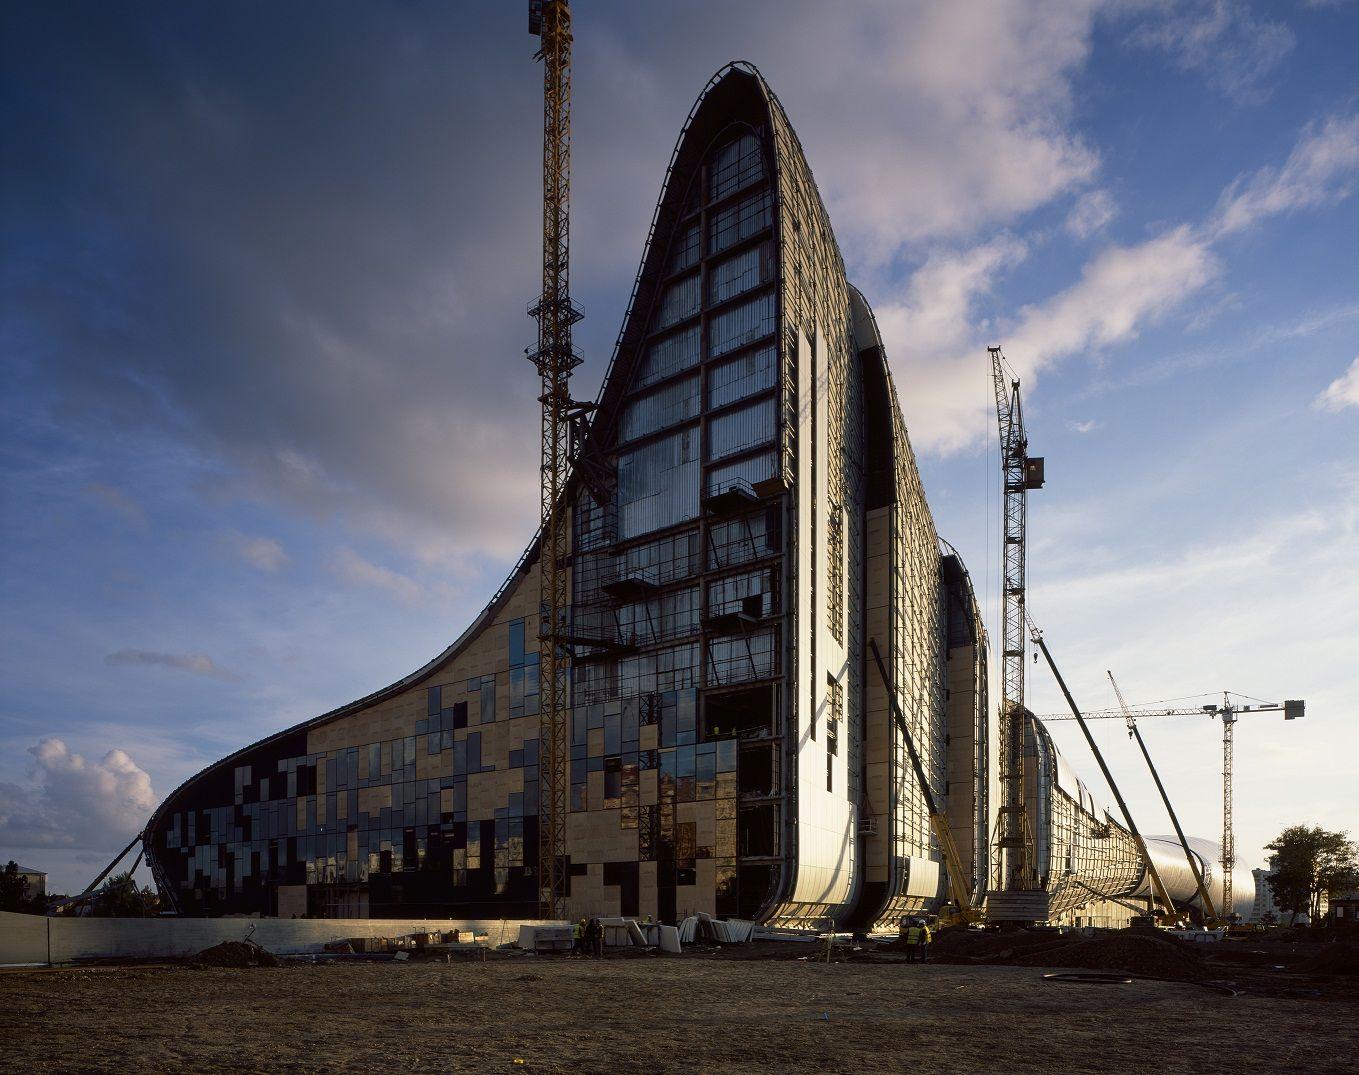 Zaha Hadid Architects Have Designed The Heydar Aliyev Center In Baku,  Azerbaijan.